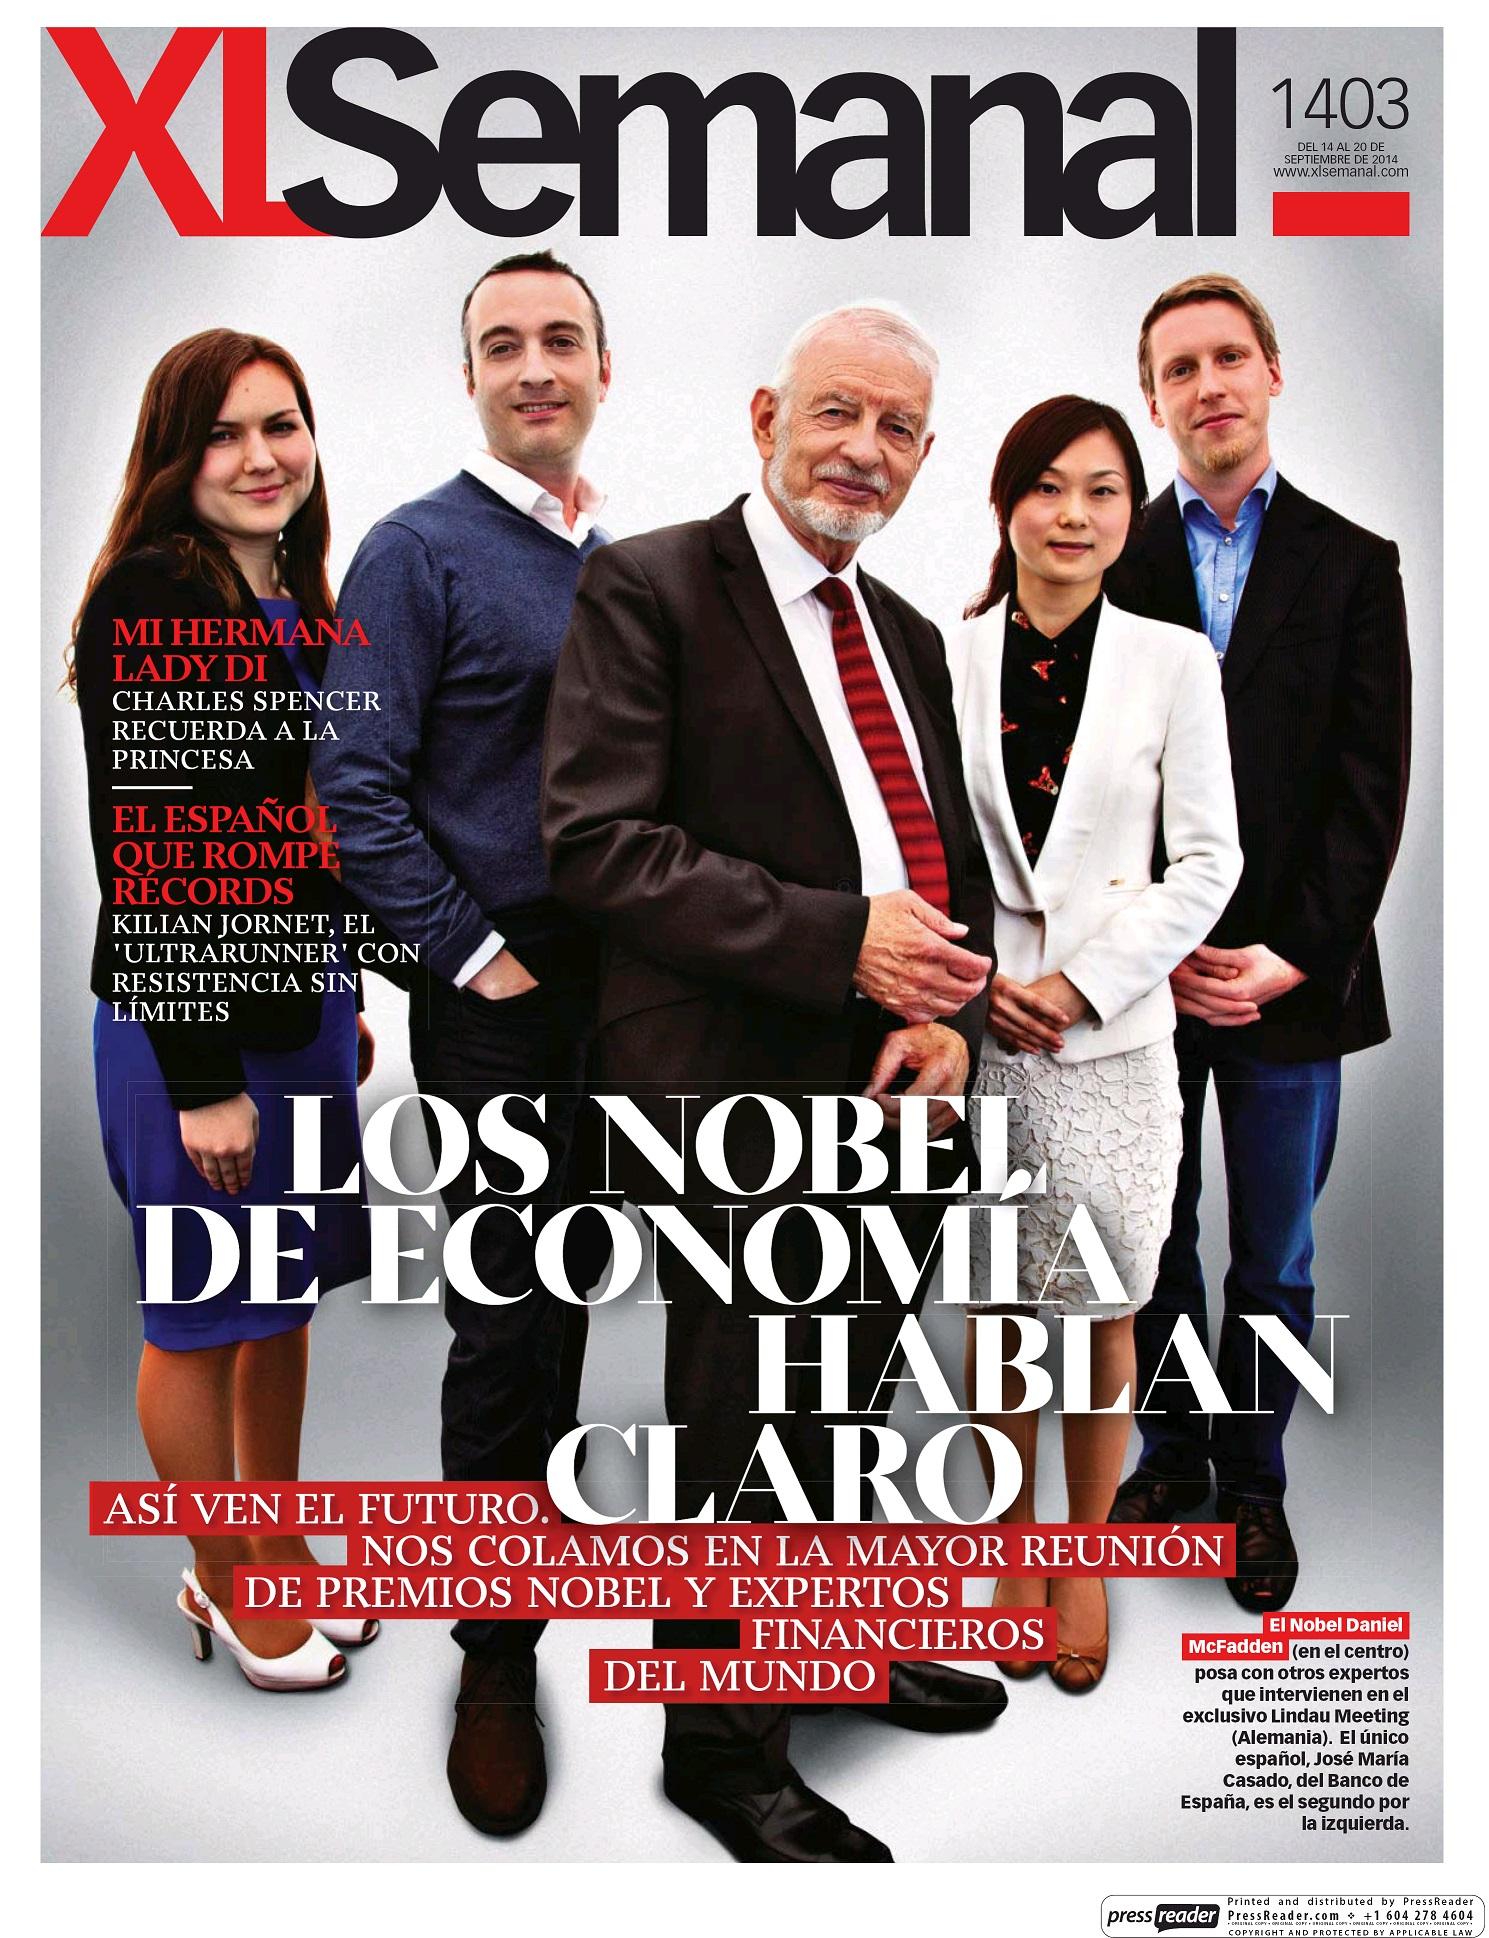 XL SEMANAL portada 14 de Septiembre 2014